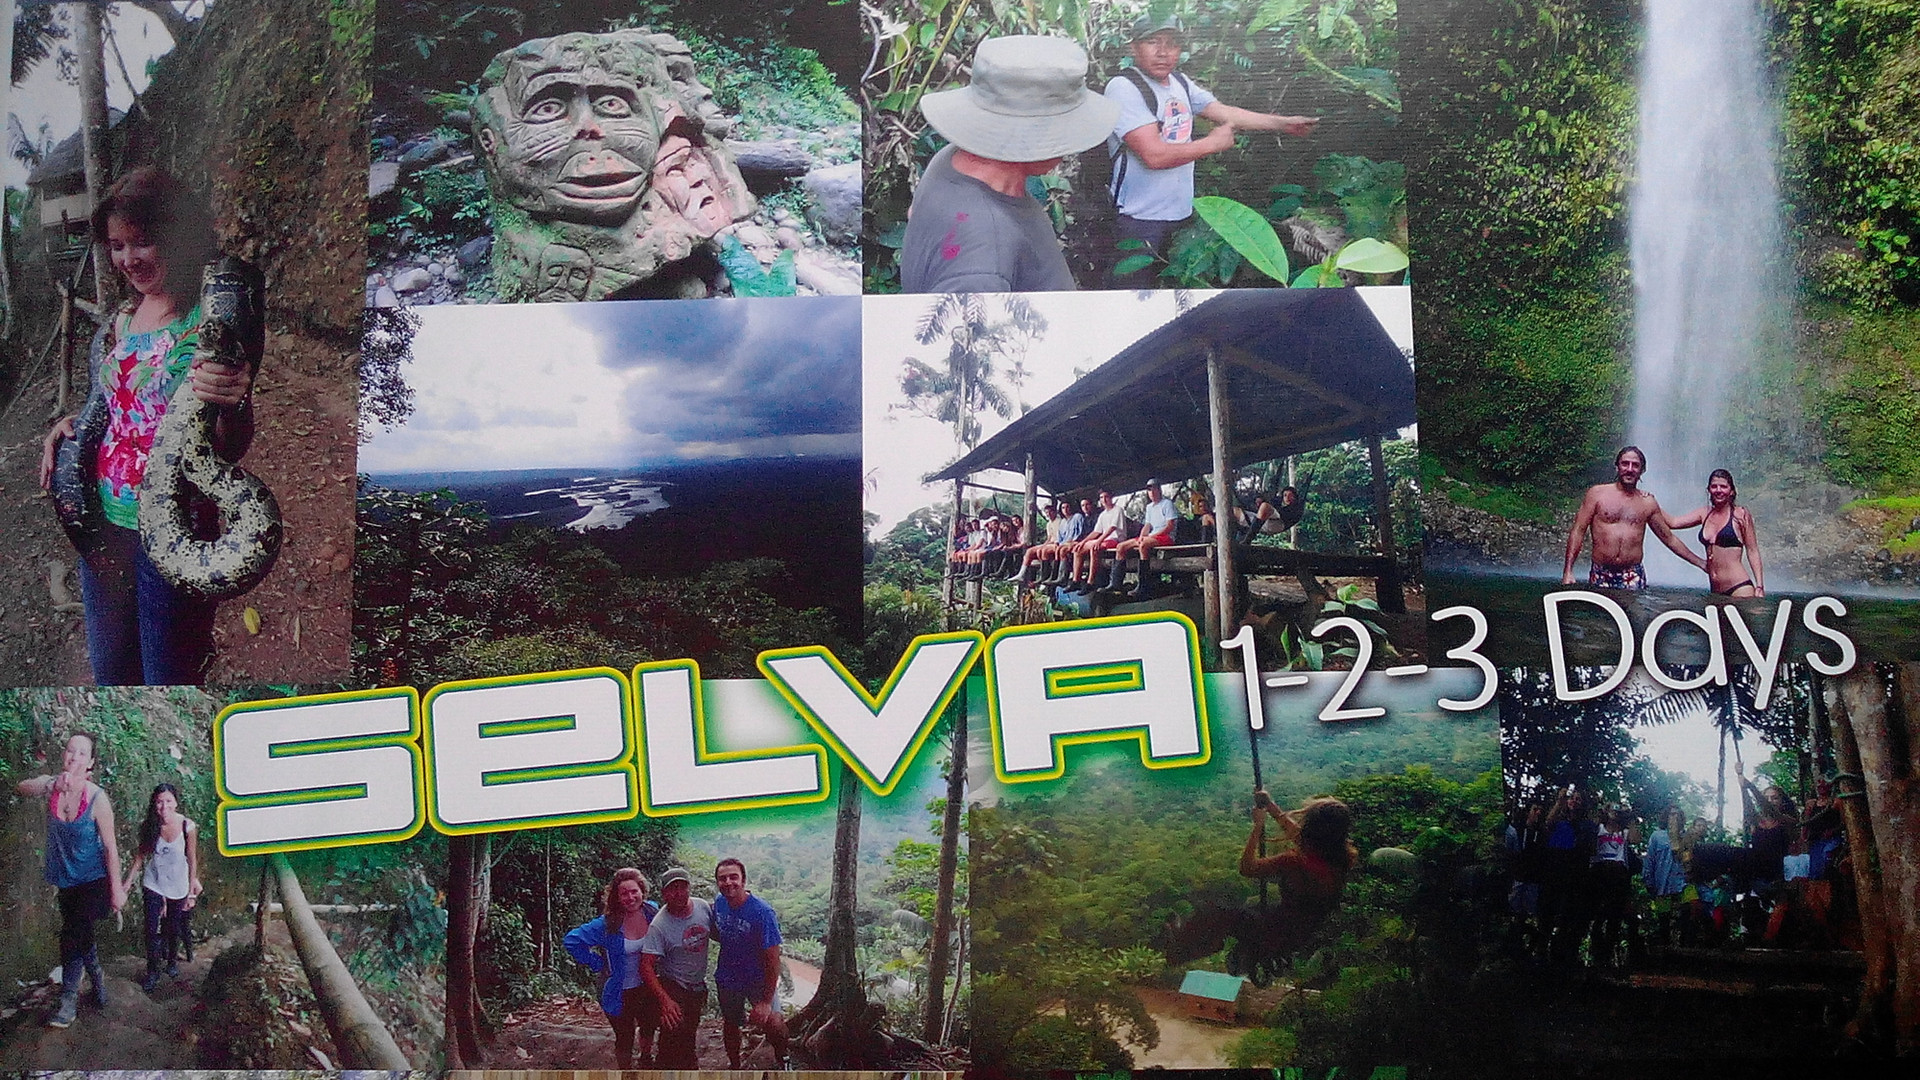 Puyo, the jungle, Ecuador